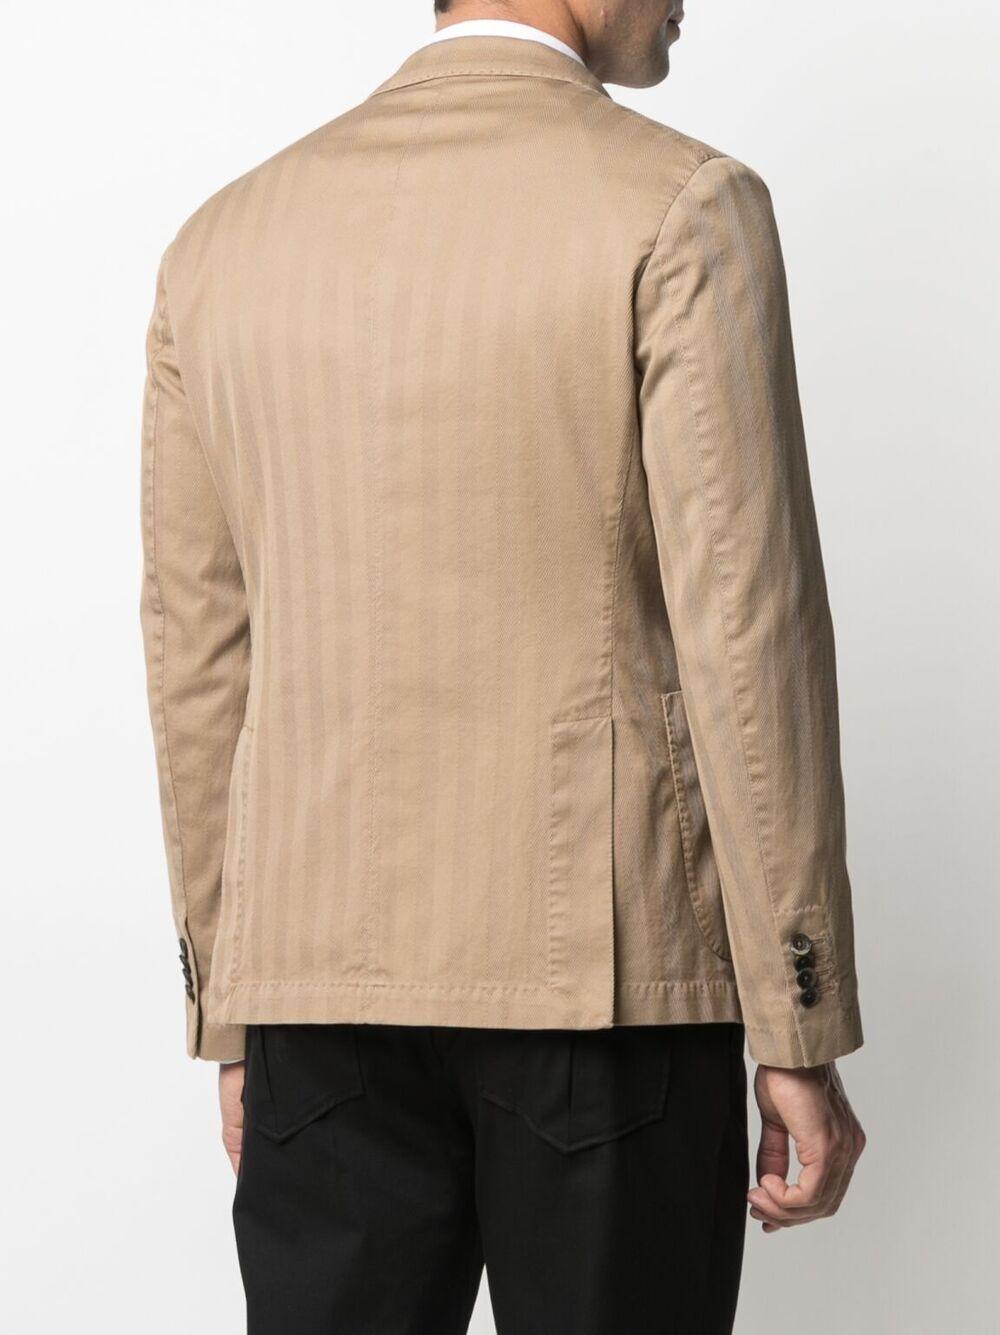 Camel cotton double-breasted stripe blazer  MANUEL RITZ |  | 3032G2738T-21300323